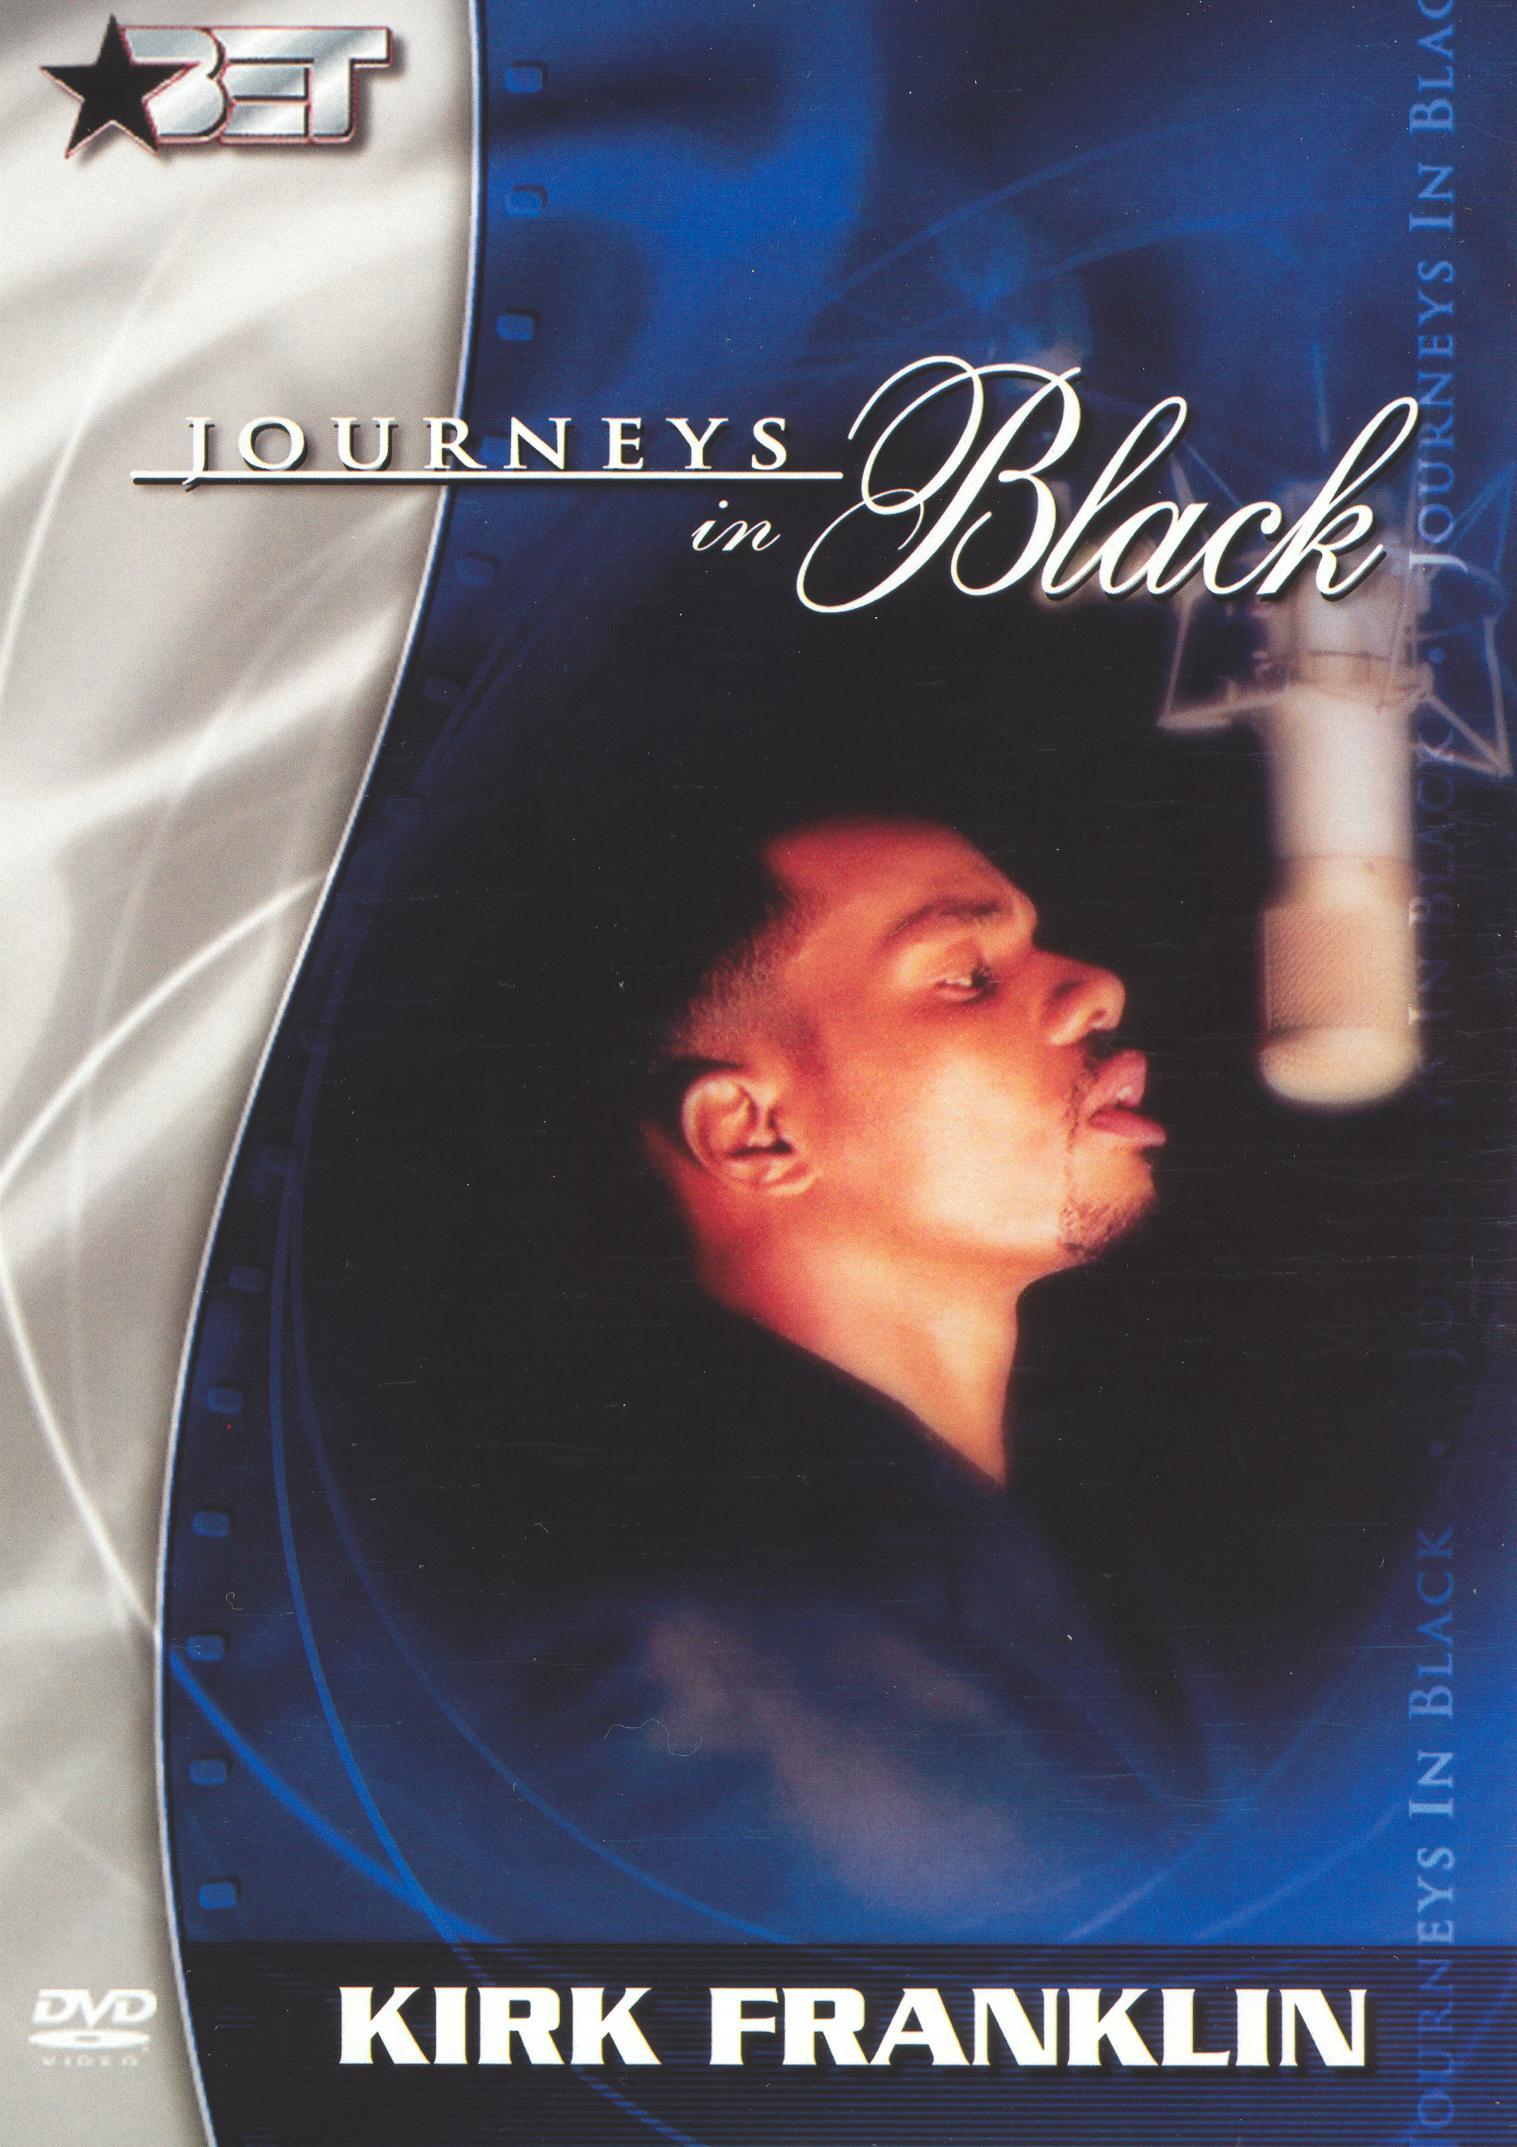 Journeys in Black: Kirk Franklin